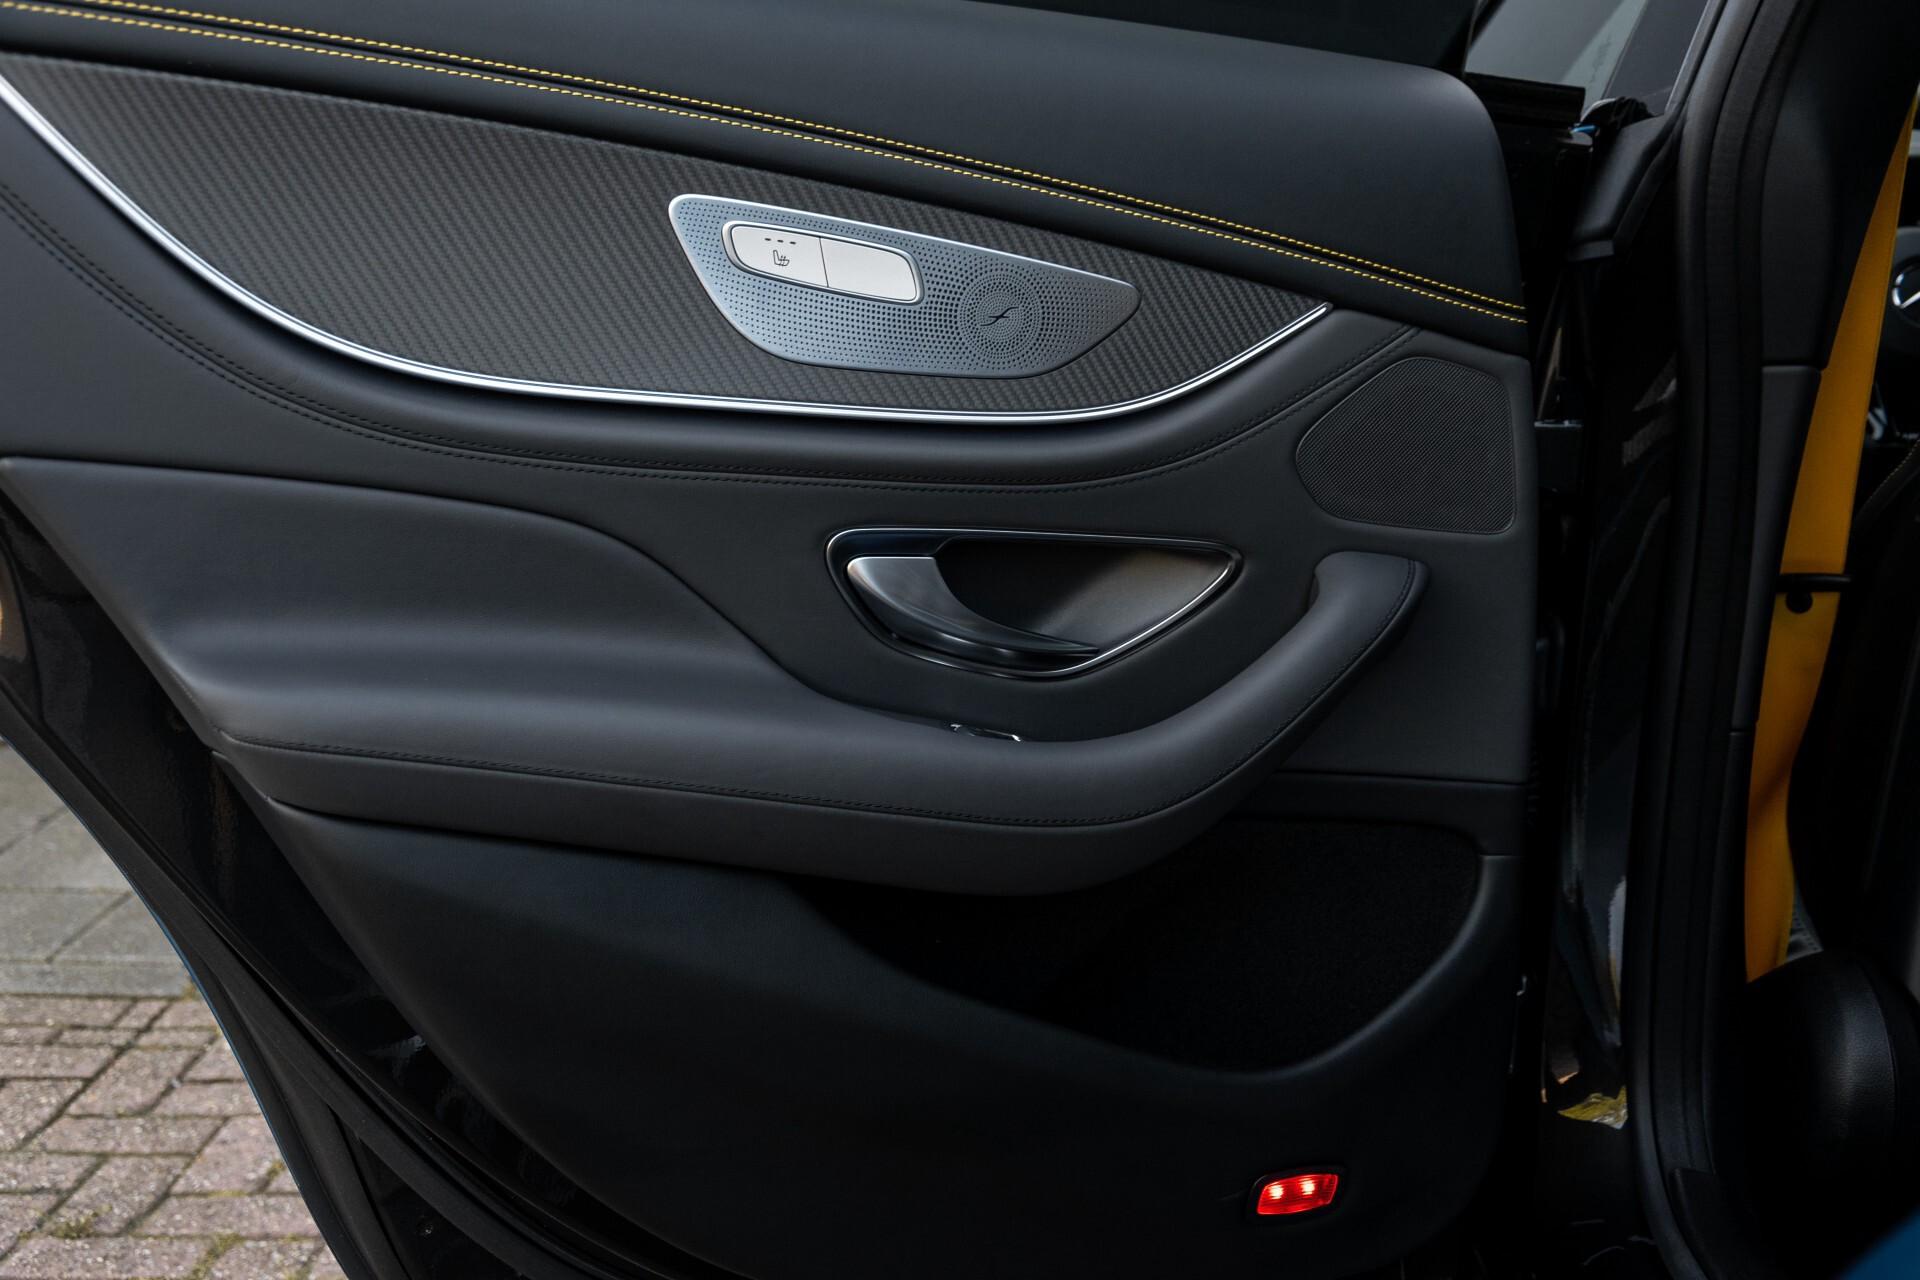 Mercedes-Benz AMG GT 4-Door Coupe 63 S 4MATIC+ Edition 1 Keramisch/Carbon/First Class/Dynamic Plus/Burmester High End 3D Aut9 Foto 60